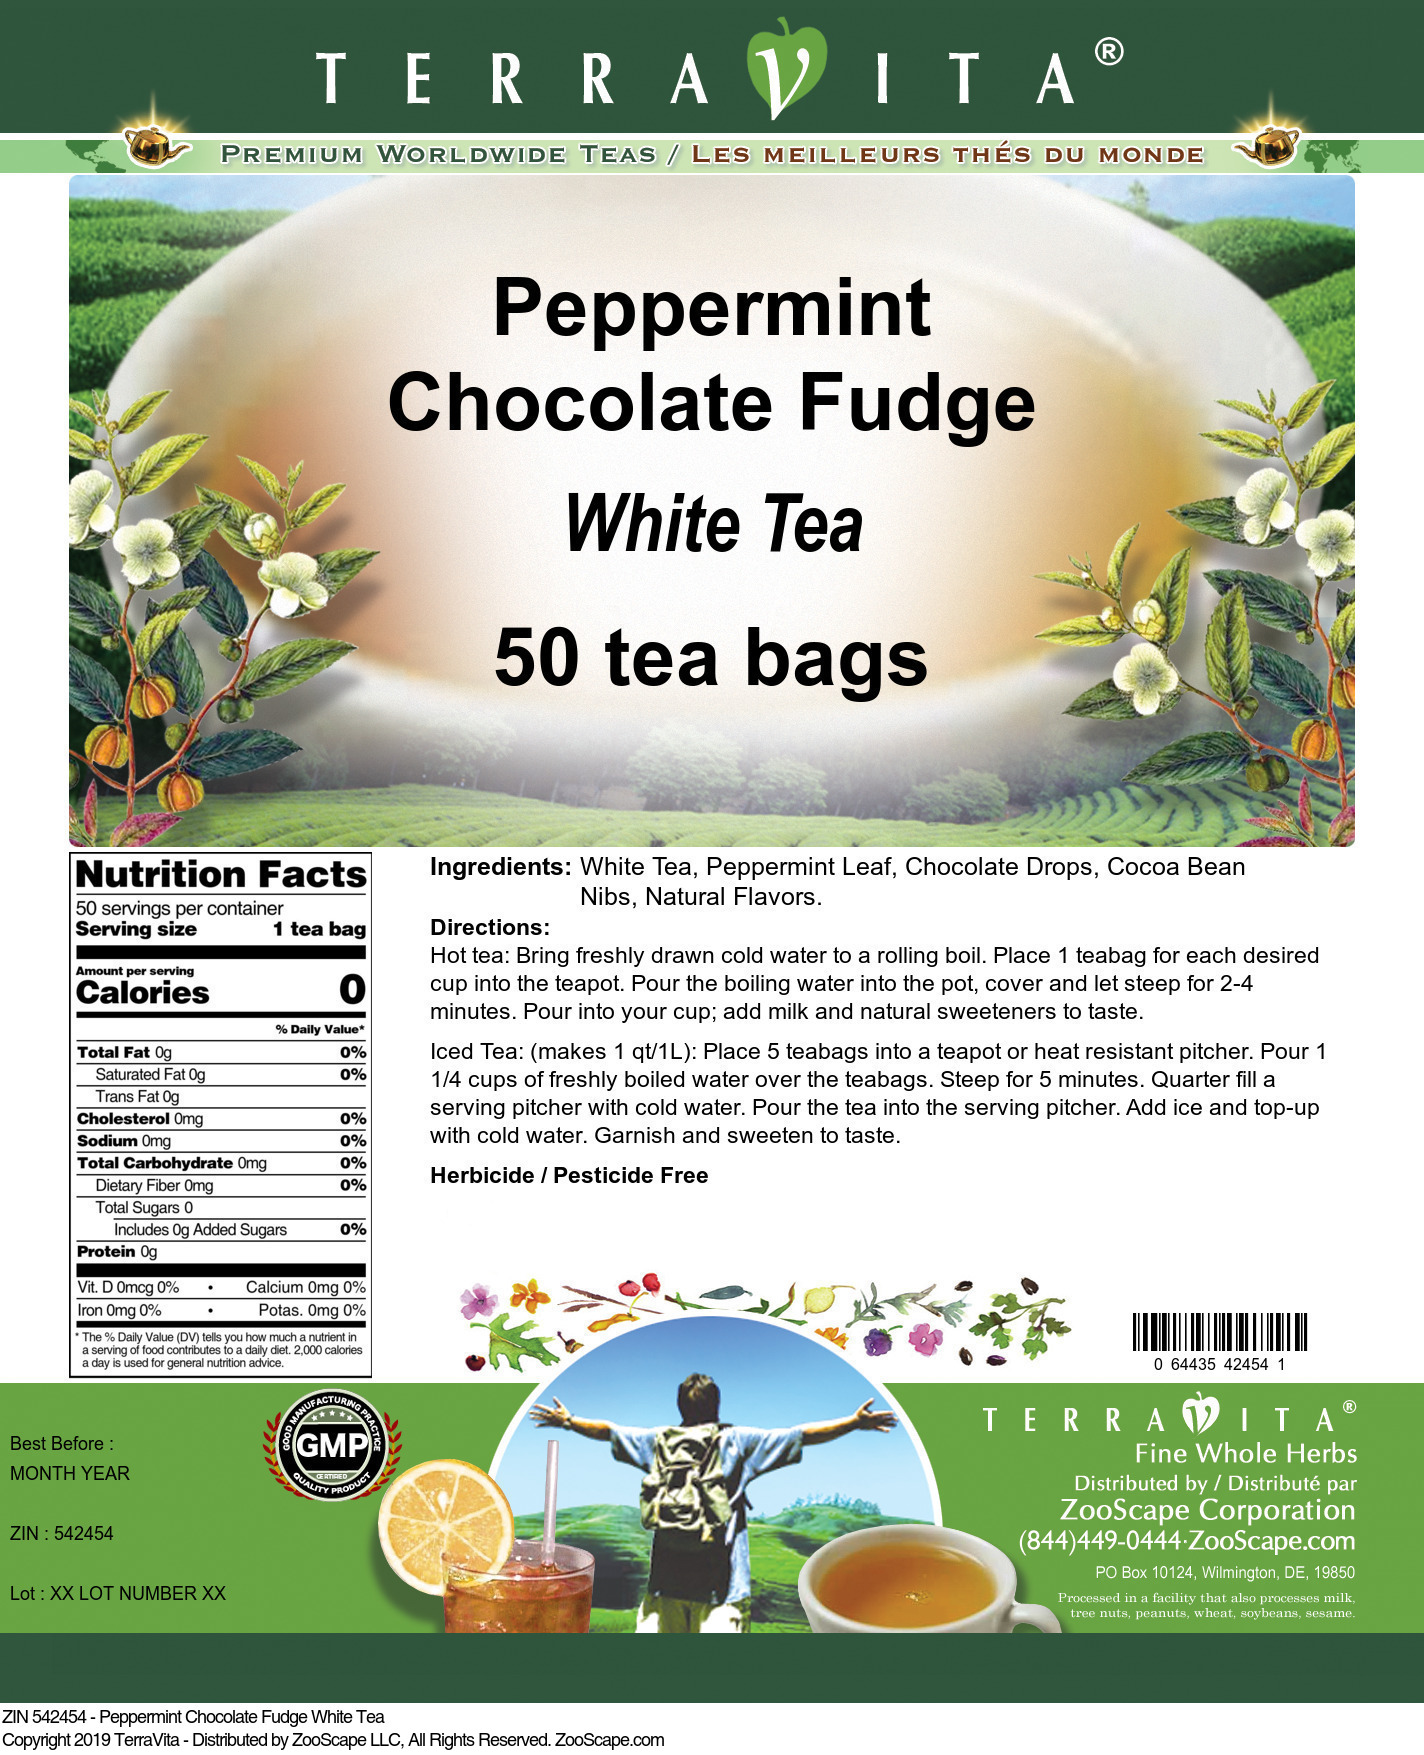 Peppermint Chocolate Fudge White Tea